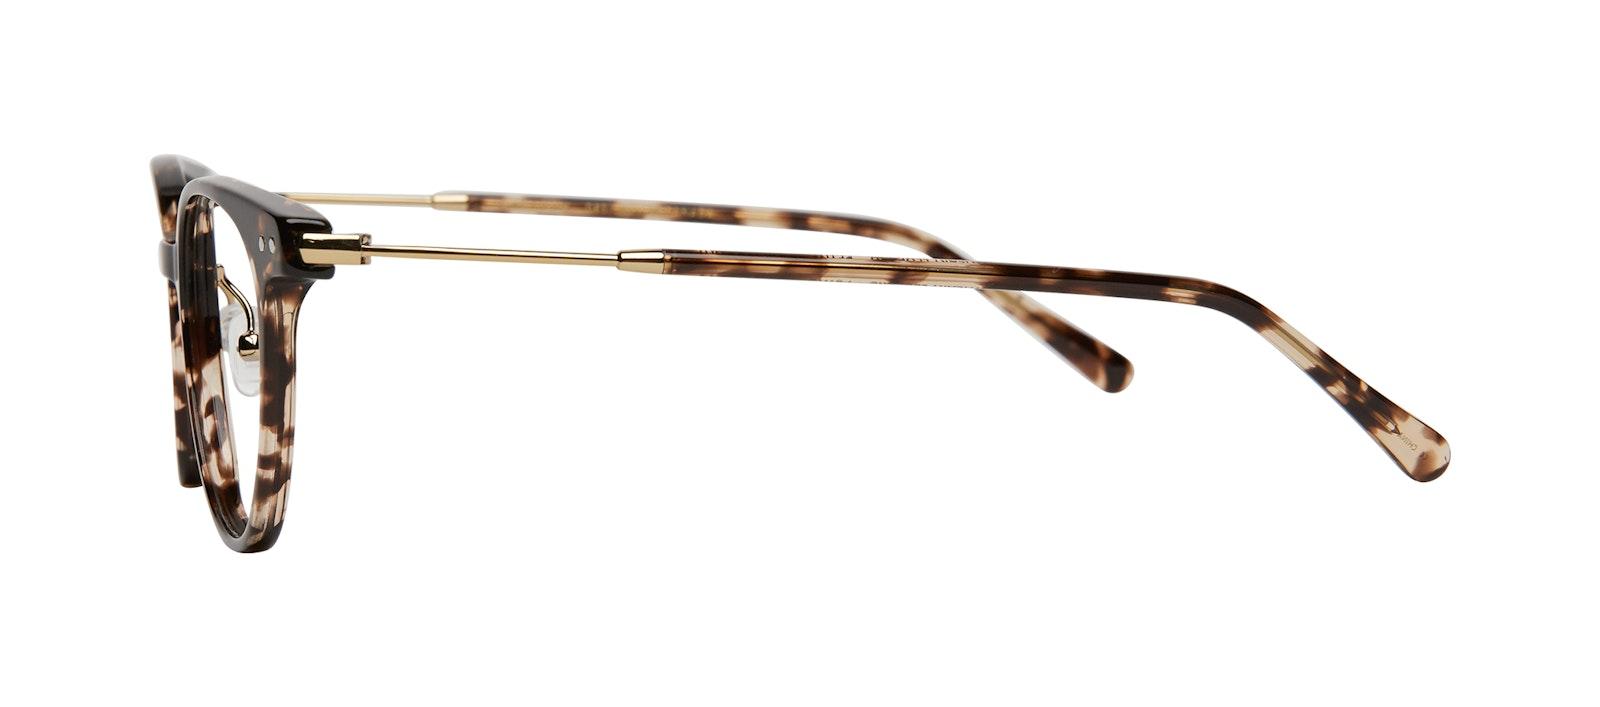 Affordable Fashion Glasses Round Eyeglasses Women Lightheart Leopard Side